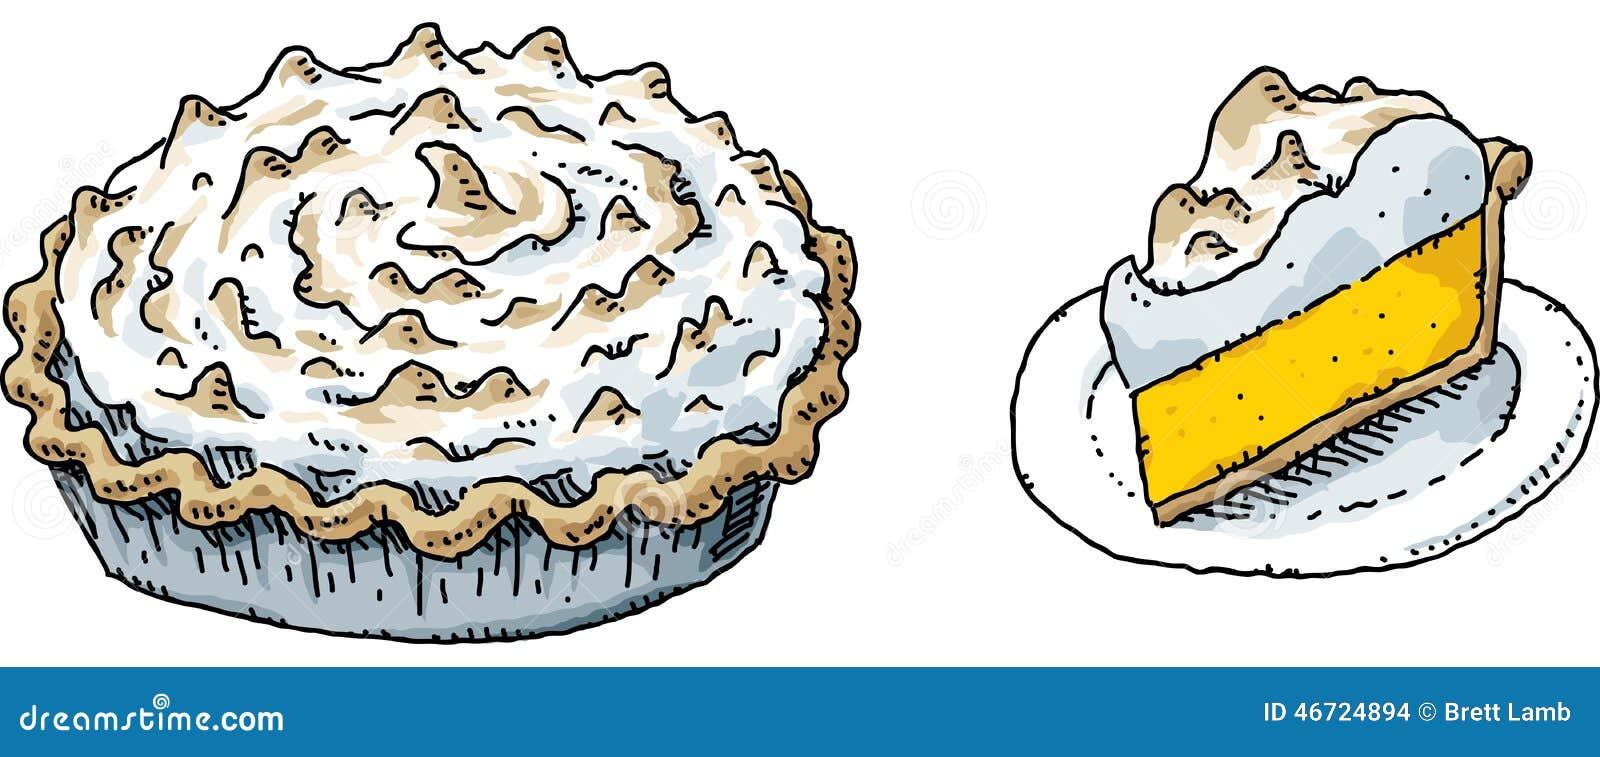 cartoon lemon meringue pie and a slice on a plate.